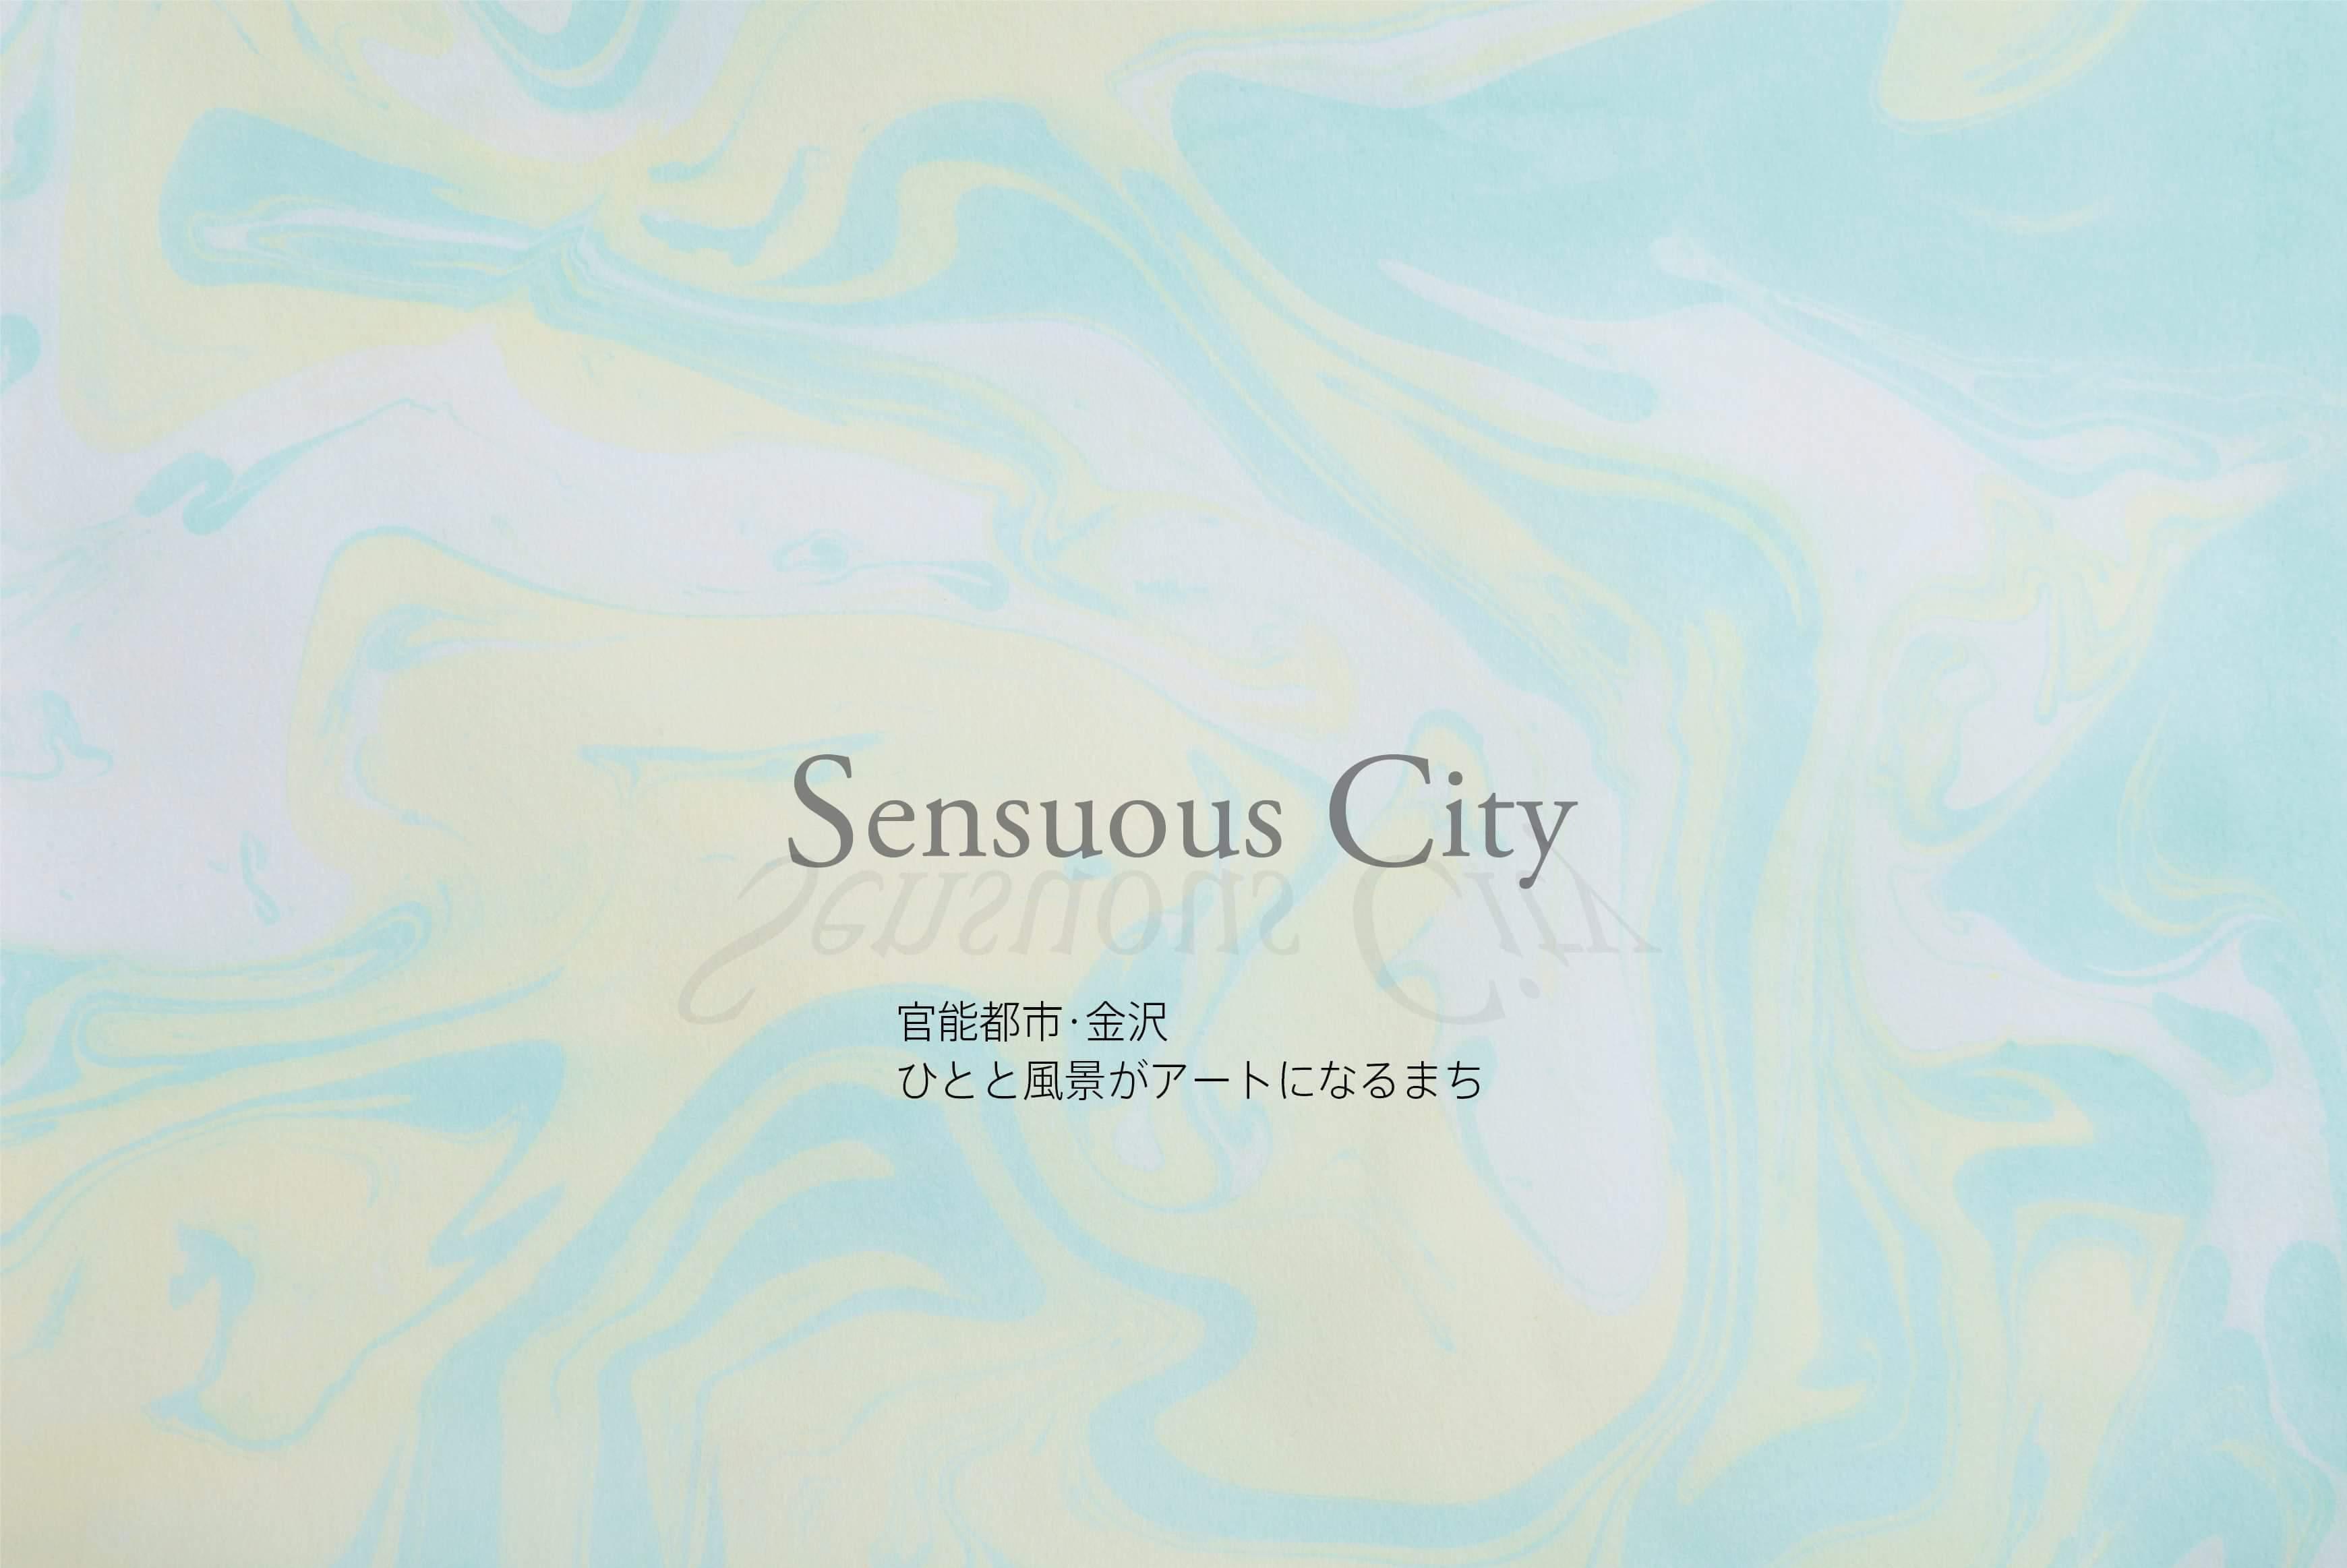 SensuousCity 官能都市・金沢  ひとと風景がアートになるまち_e0334462_01302091.jpeg